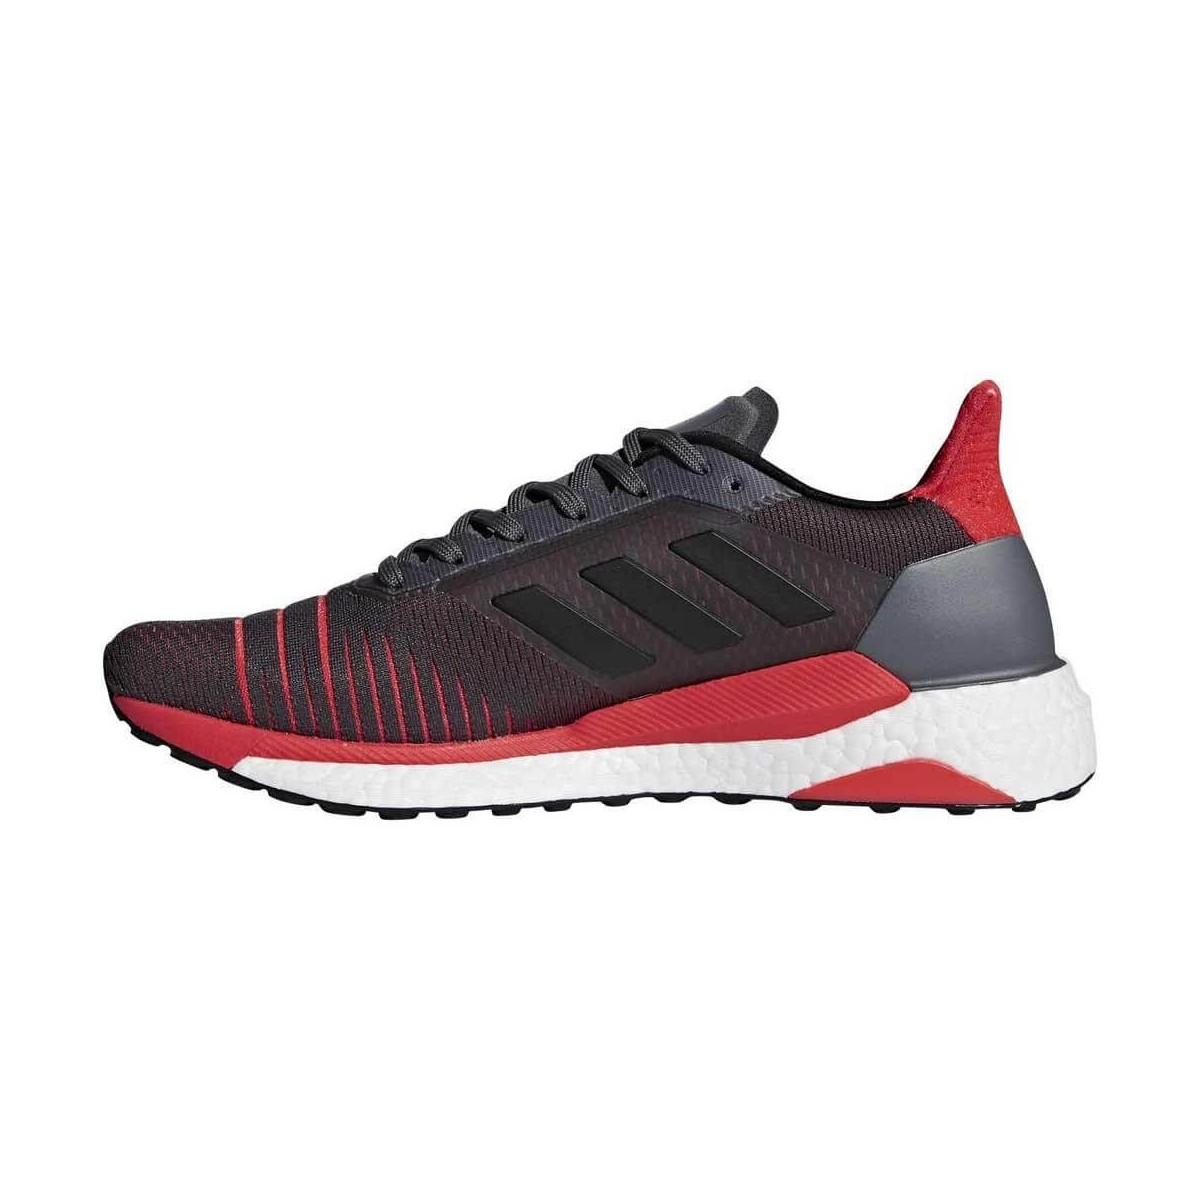 classic fit c18f0 49b0b ... Adidas Solar Glide OI18 Gris Rojo Hombre ...